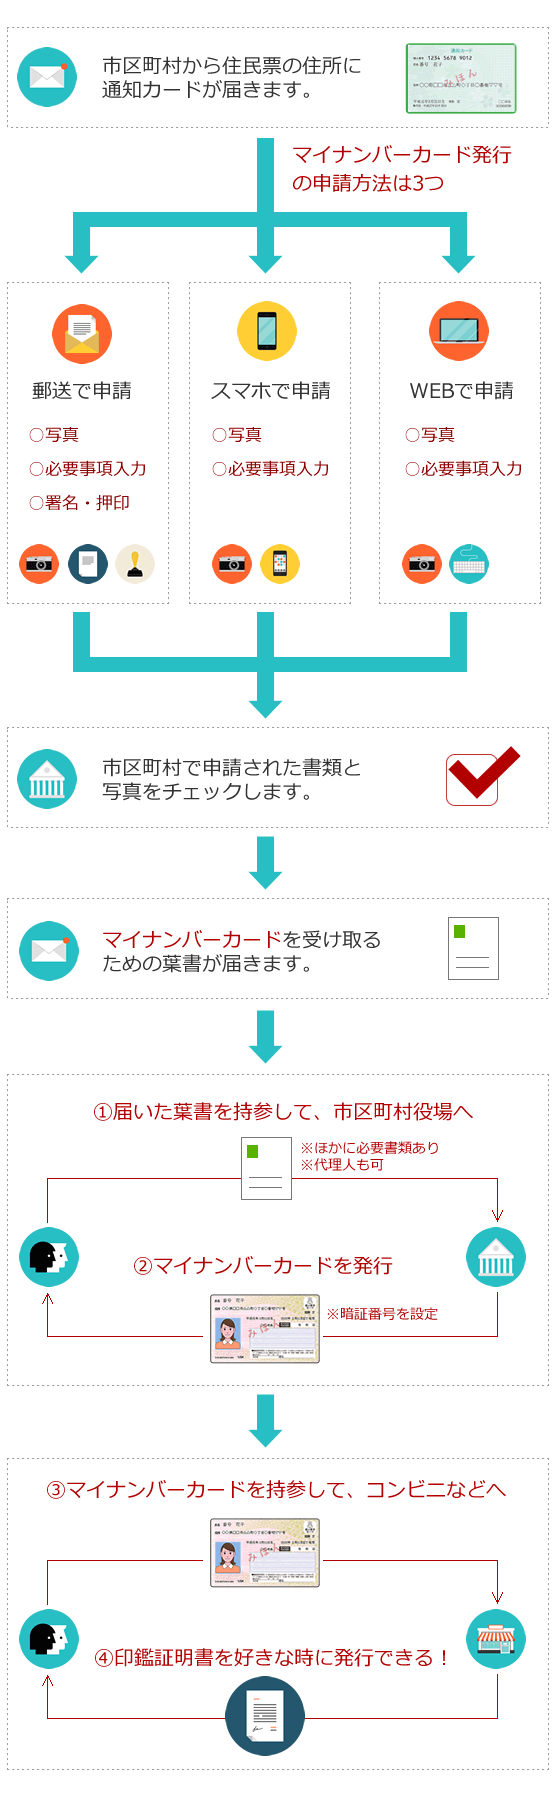 mynumber_image013